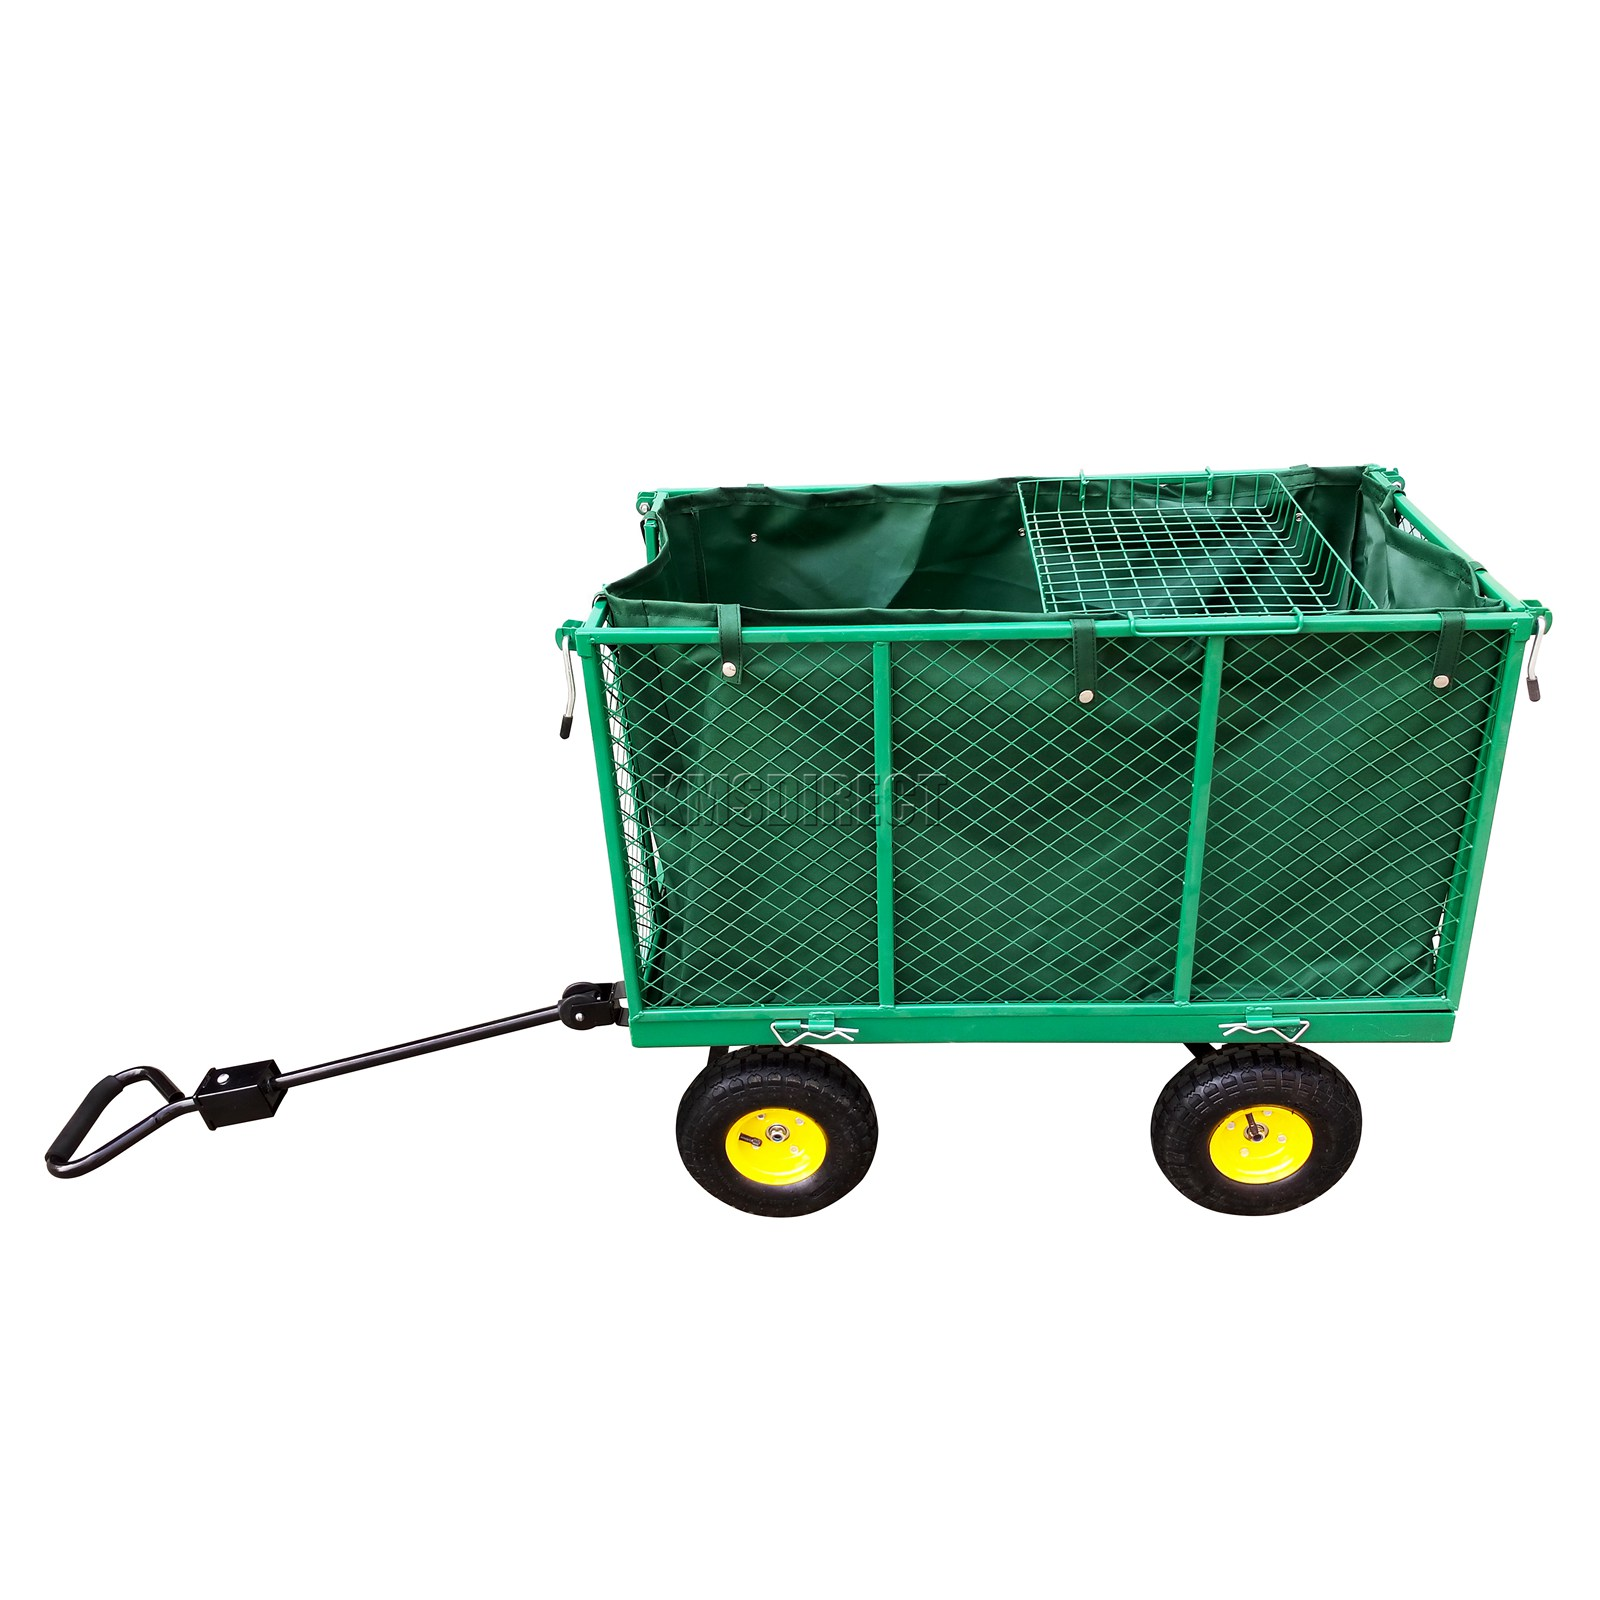 FoxHunter-Heavy-Duty-Garden-Dump-Truck-Tipping-Trailer-Trolley-Cart-Wheelbarrow miniatuur 16